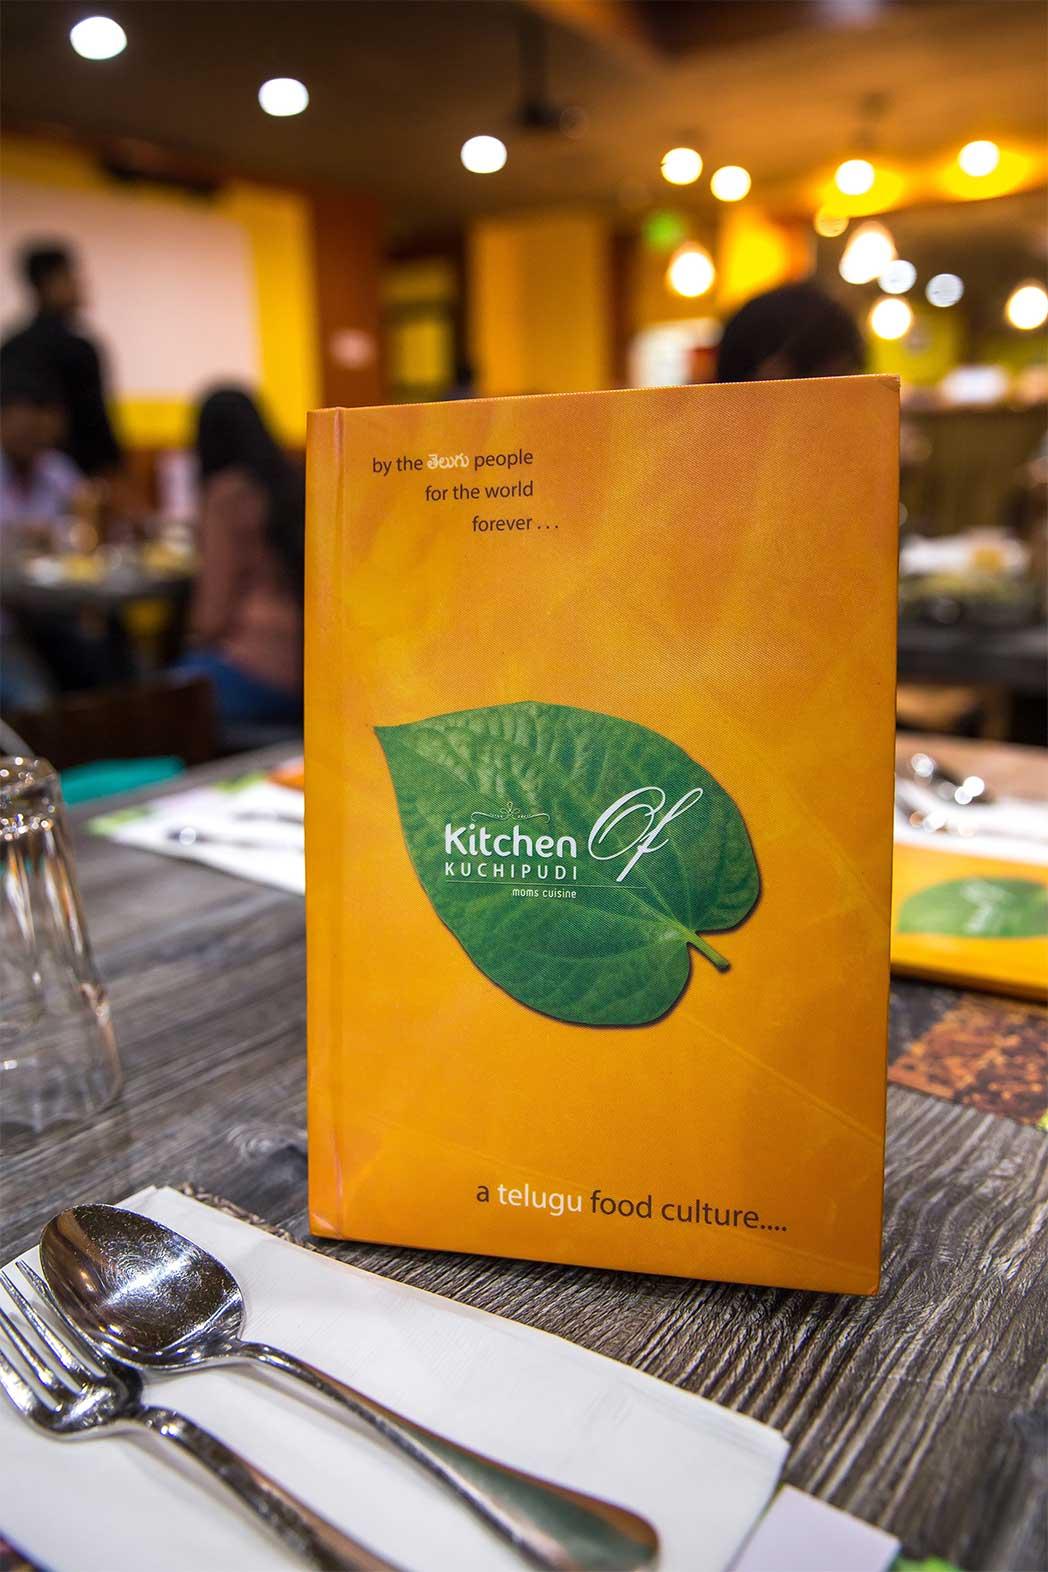 Kitchen of Kuchipudi Kitchen of Kuchipudi restaurant review bayarea restaurants telugu cuisine foodlove foodies foodphotography foodblog